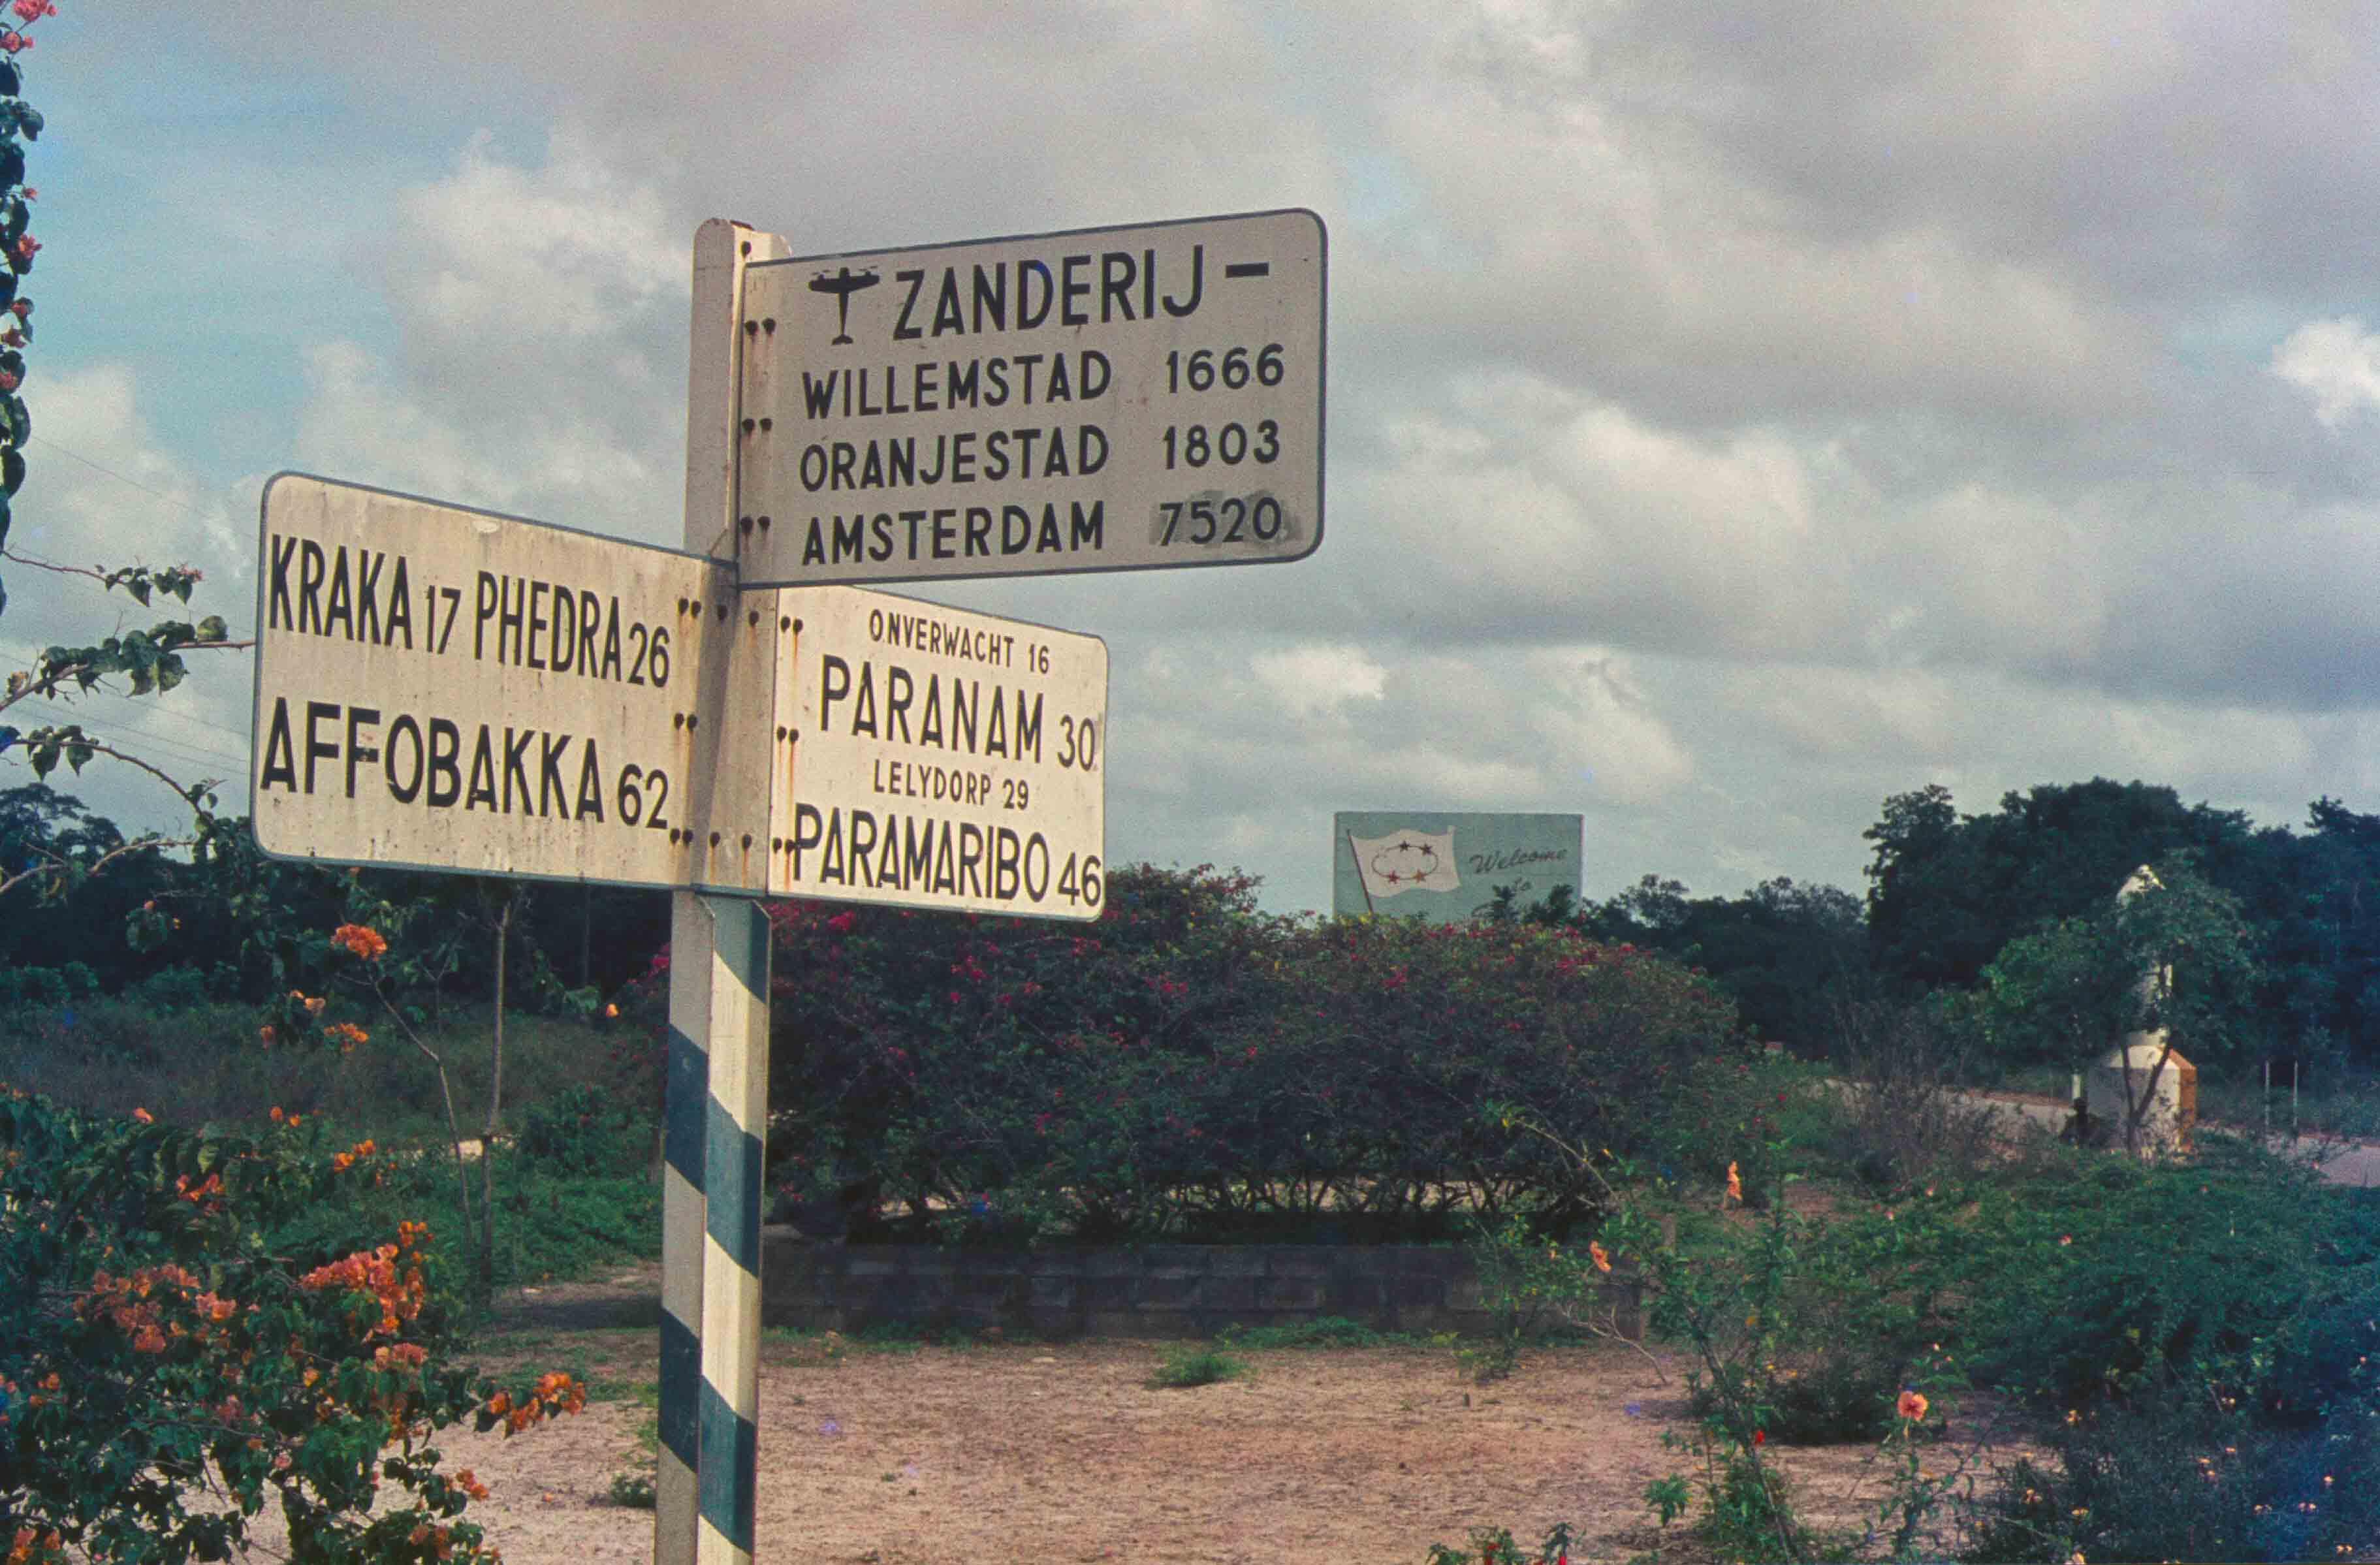 51. Suriname